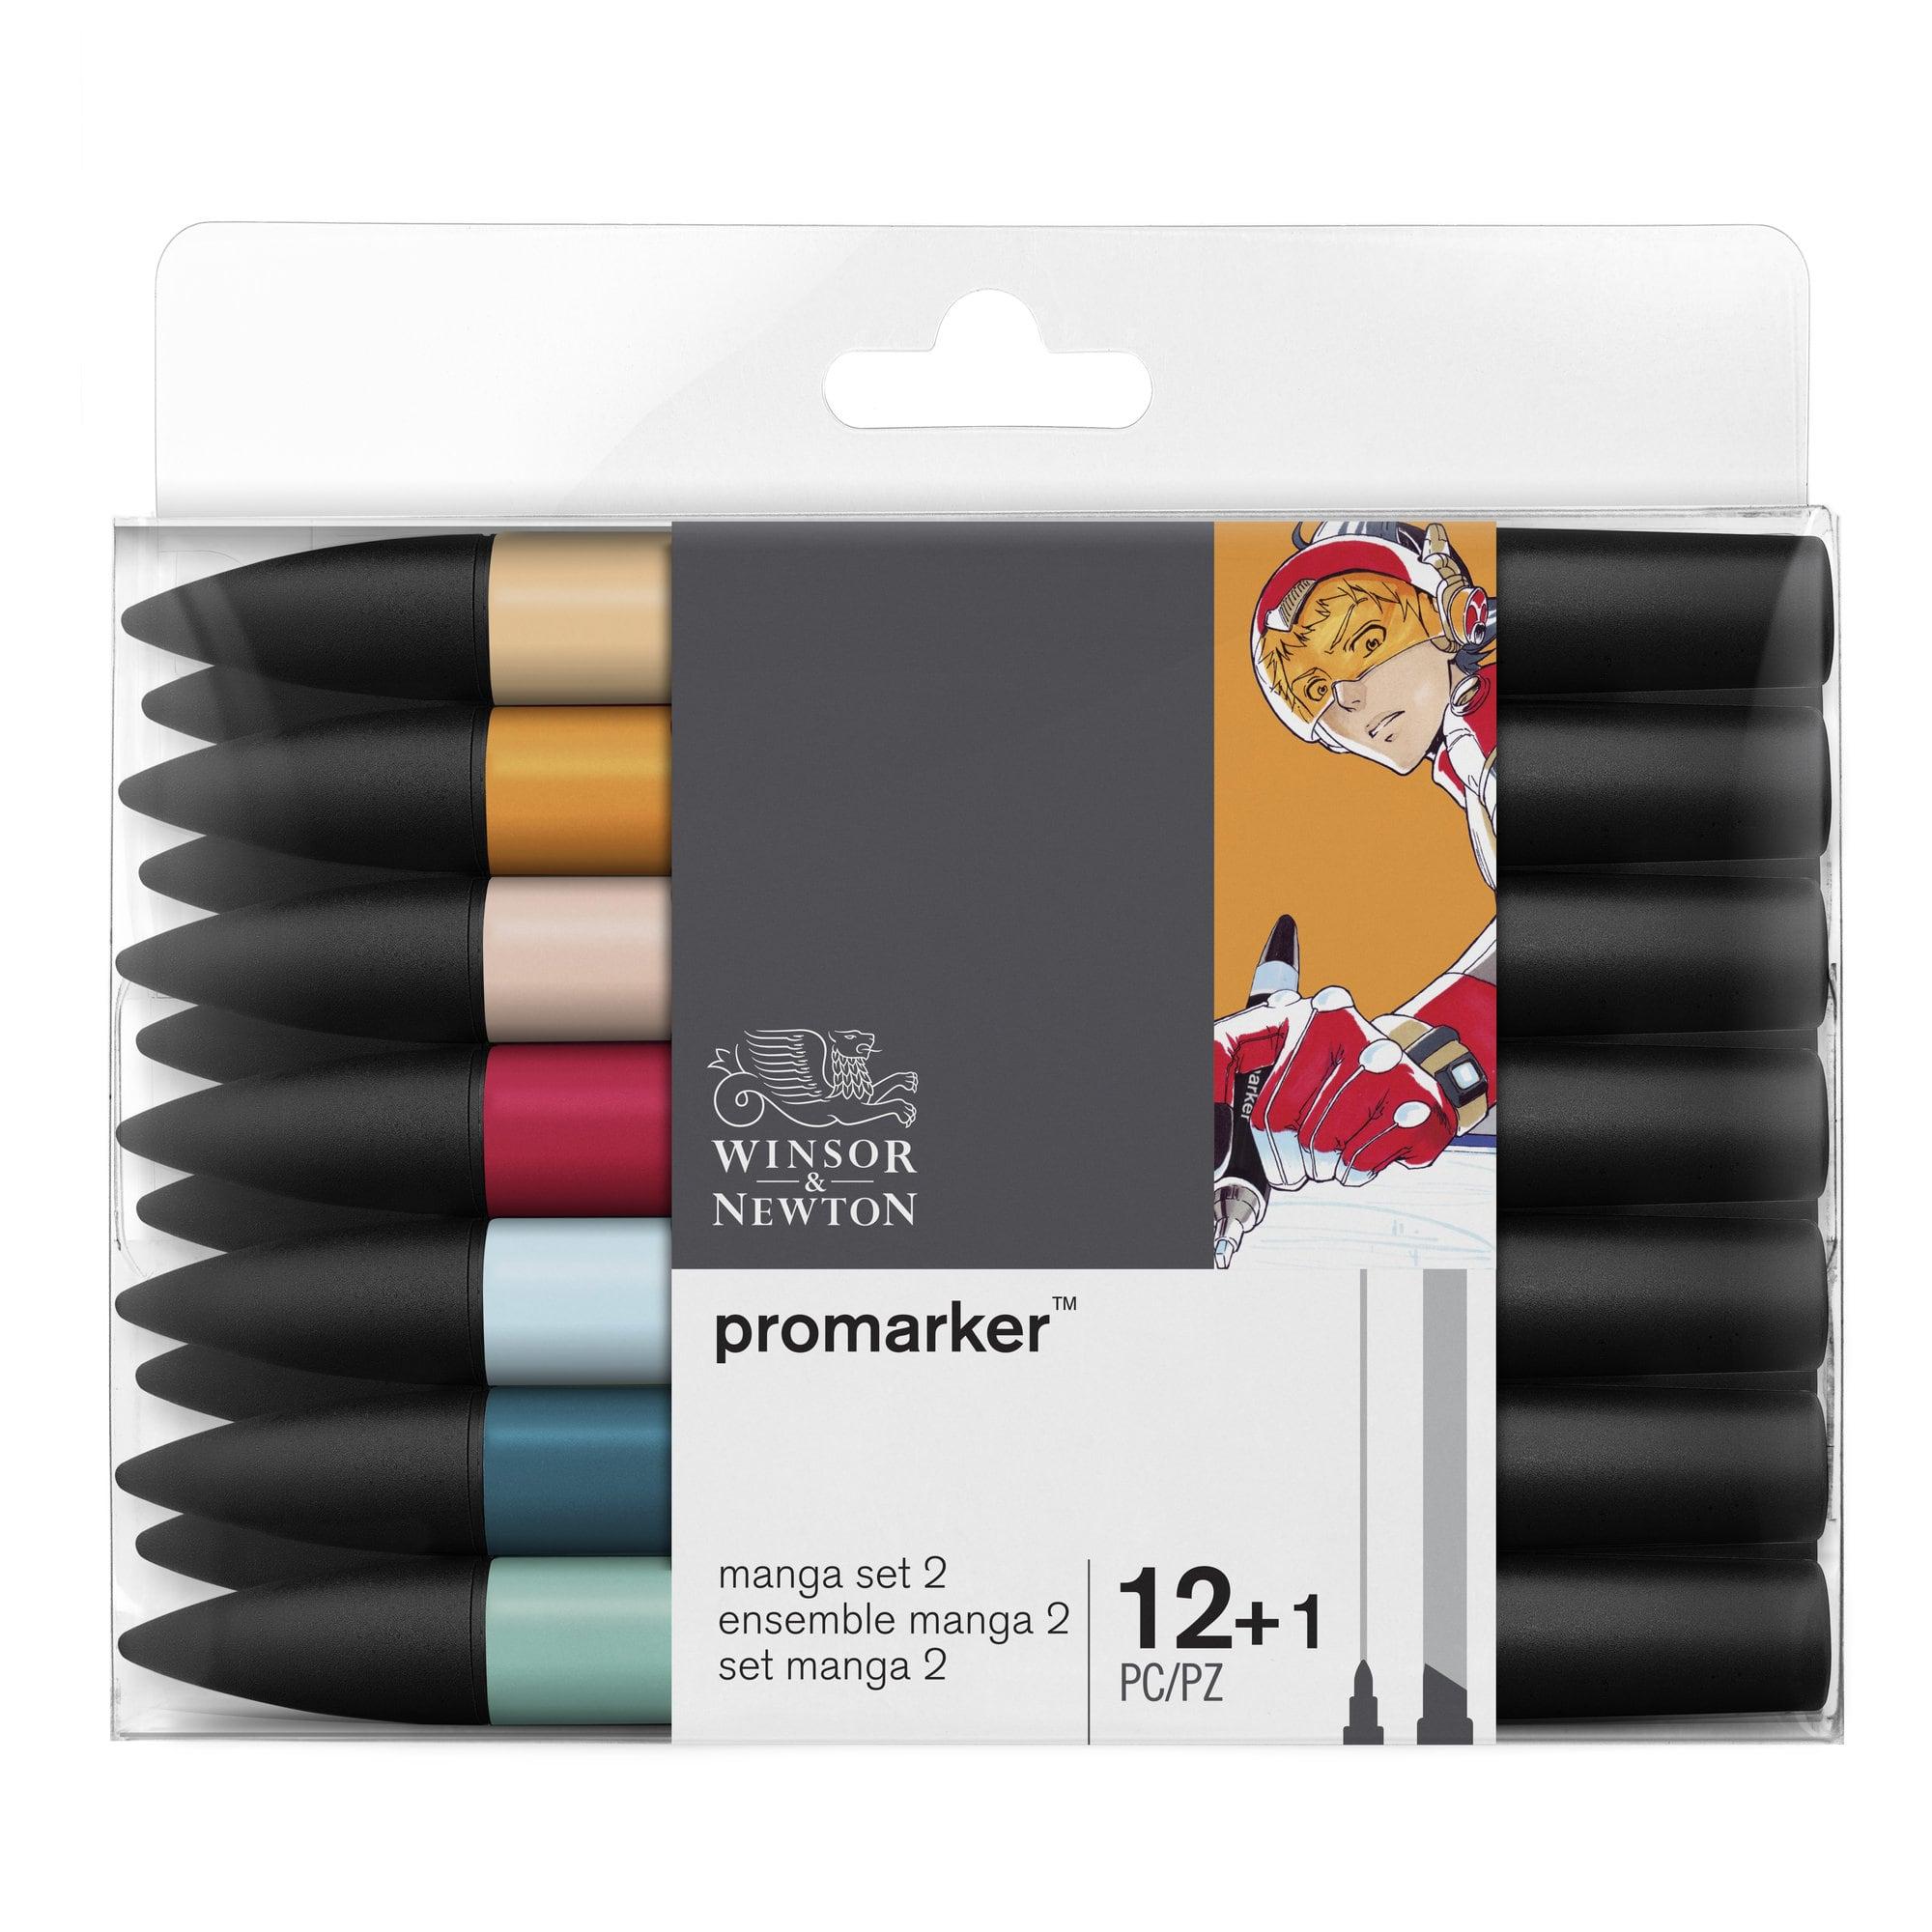 ProMarker - Pack de 13 marqueurs double pointe - manga expansion pack 2